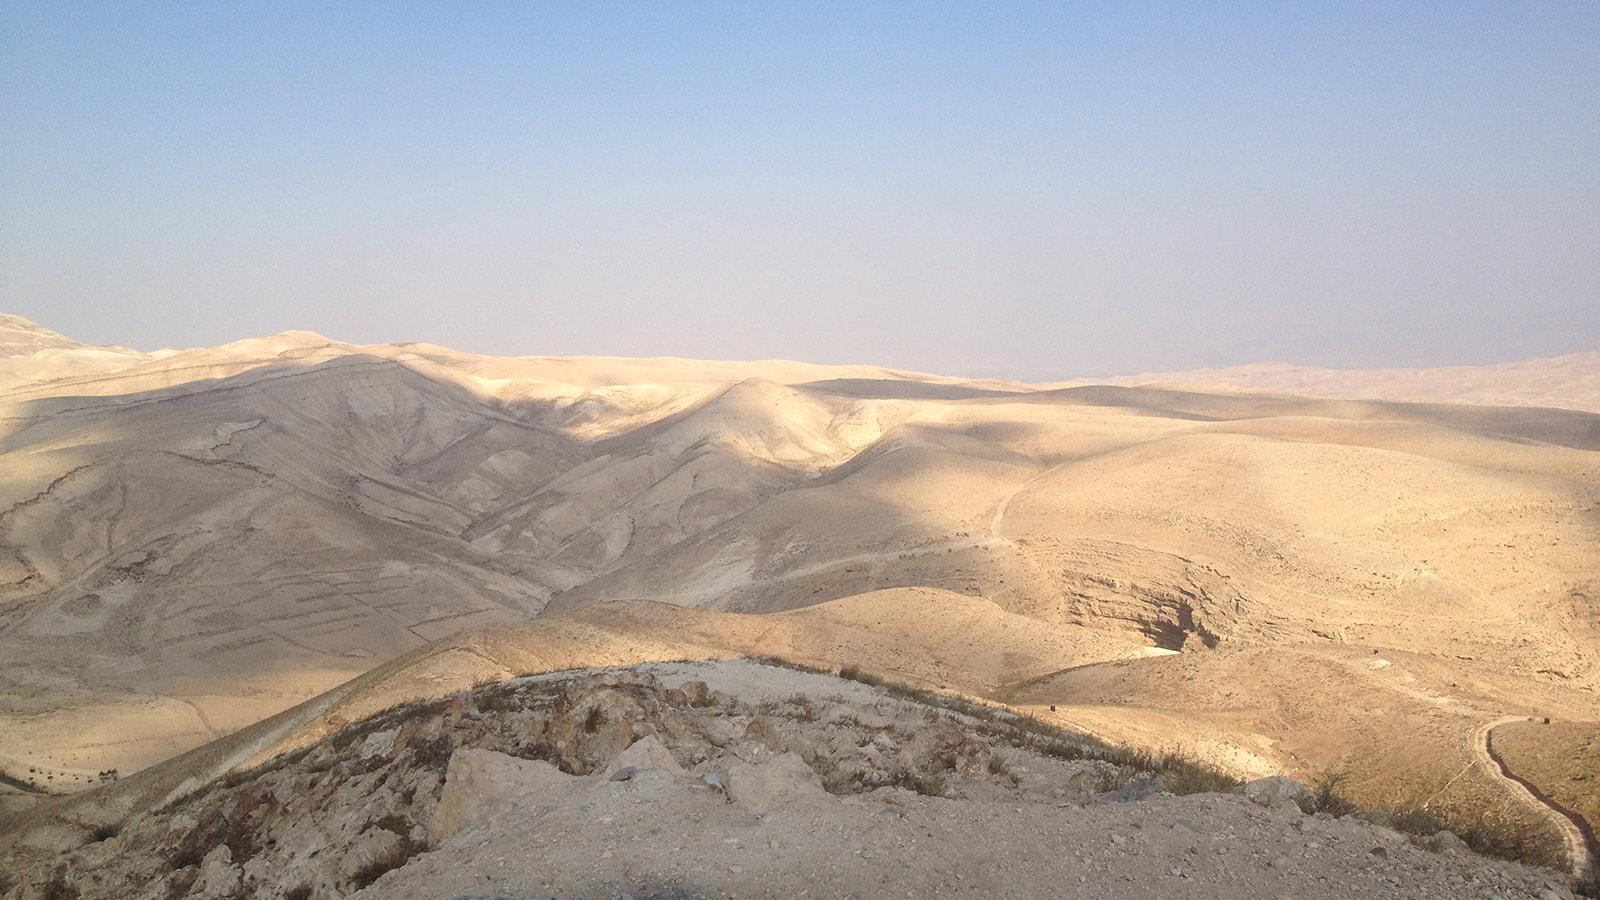 Guy-Stagg-The-Crossway-Judean-Desert